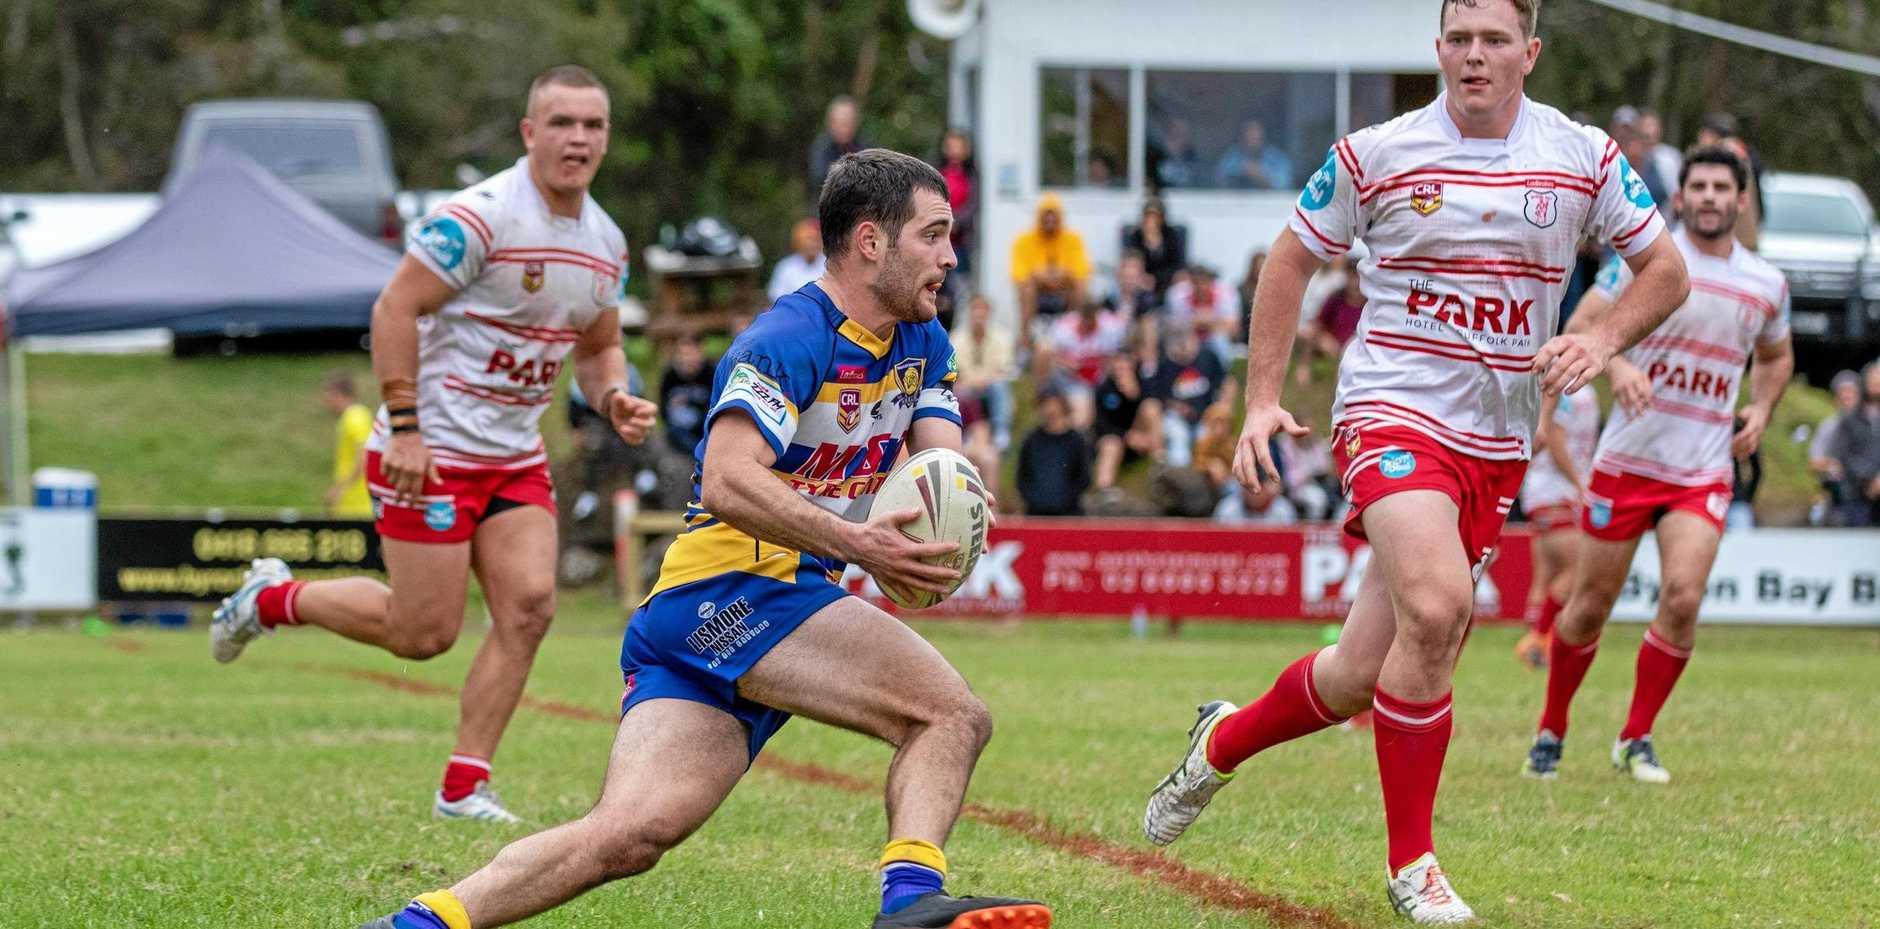 Marist Brothers fullback Jacob Follent against Byron Bay in NRRRL.